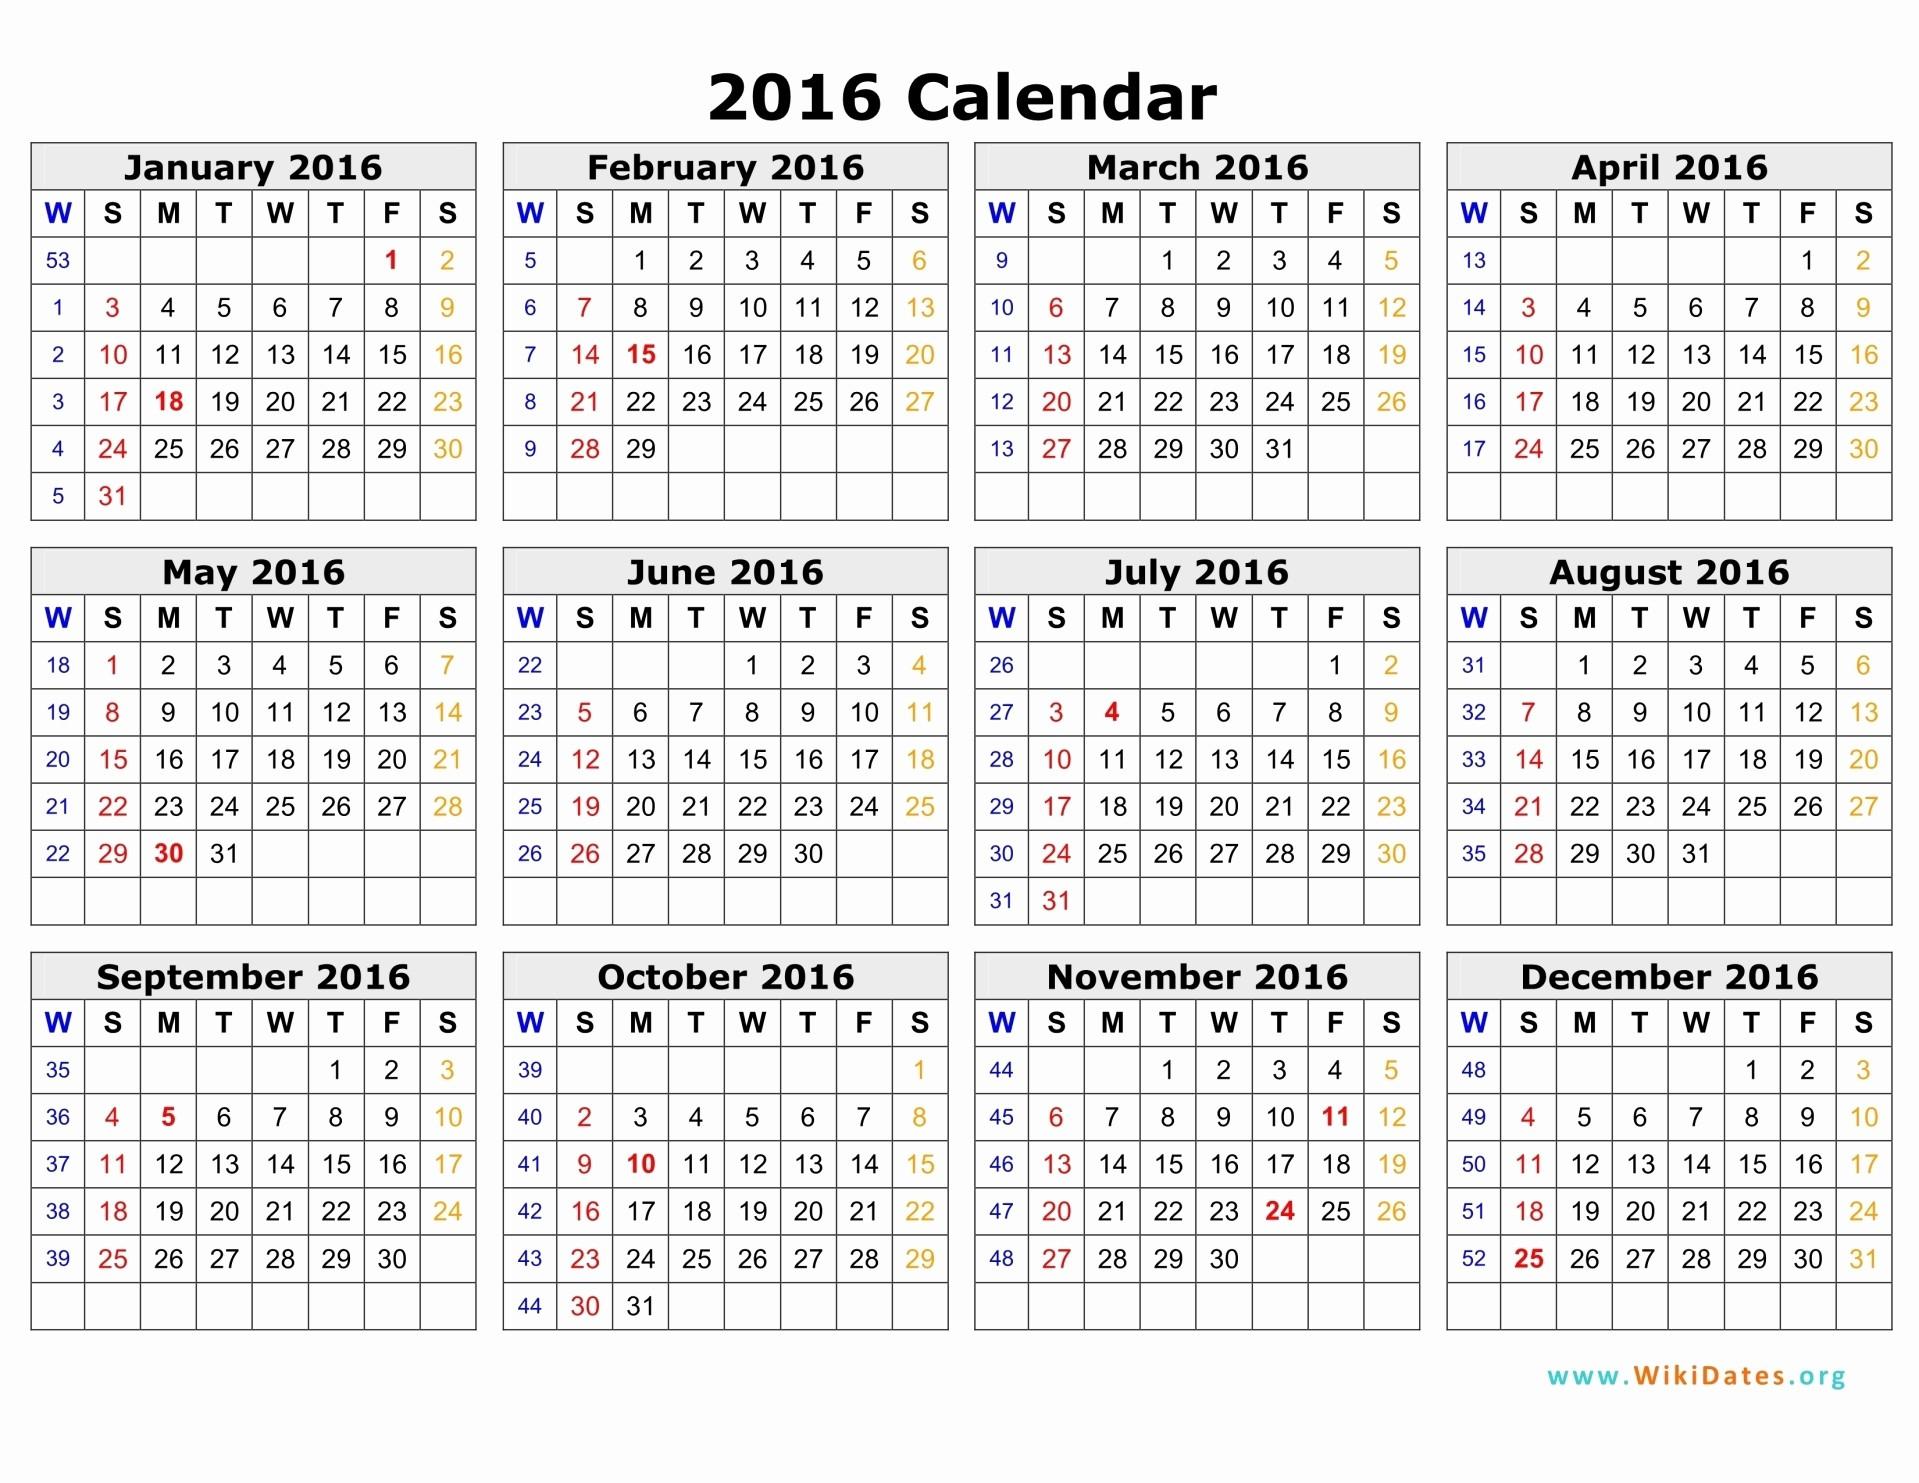 2016 Calendar Excel with Holidays Inspirational Weekly Calendar 2016